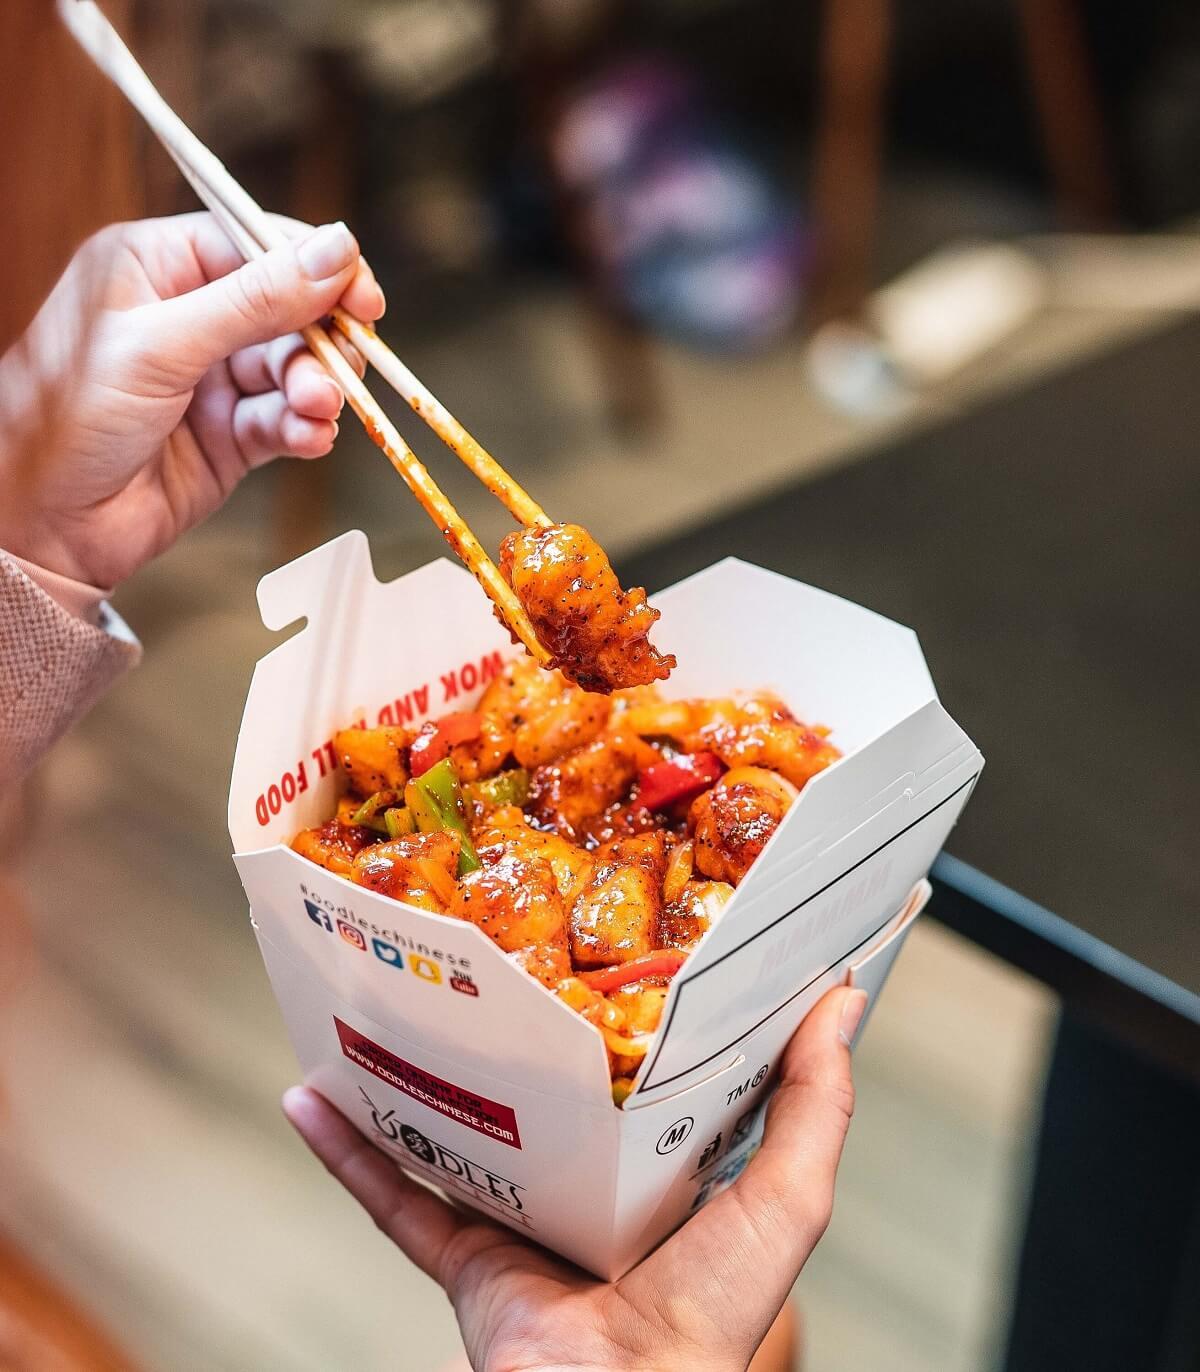 oodles food in box